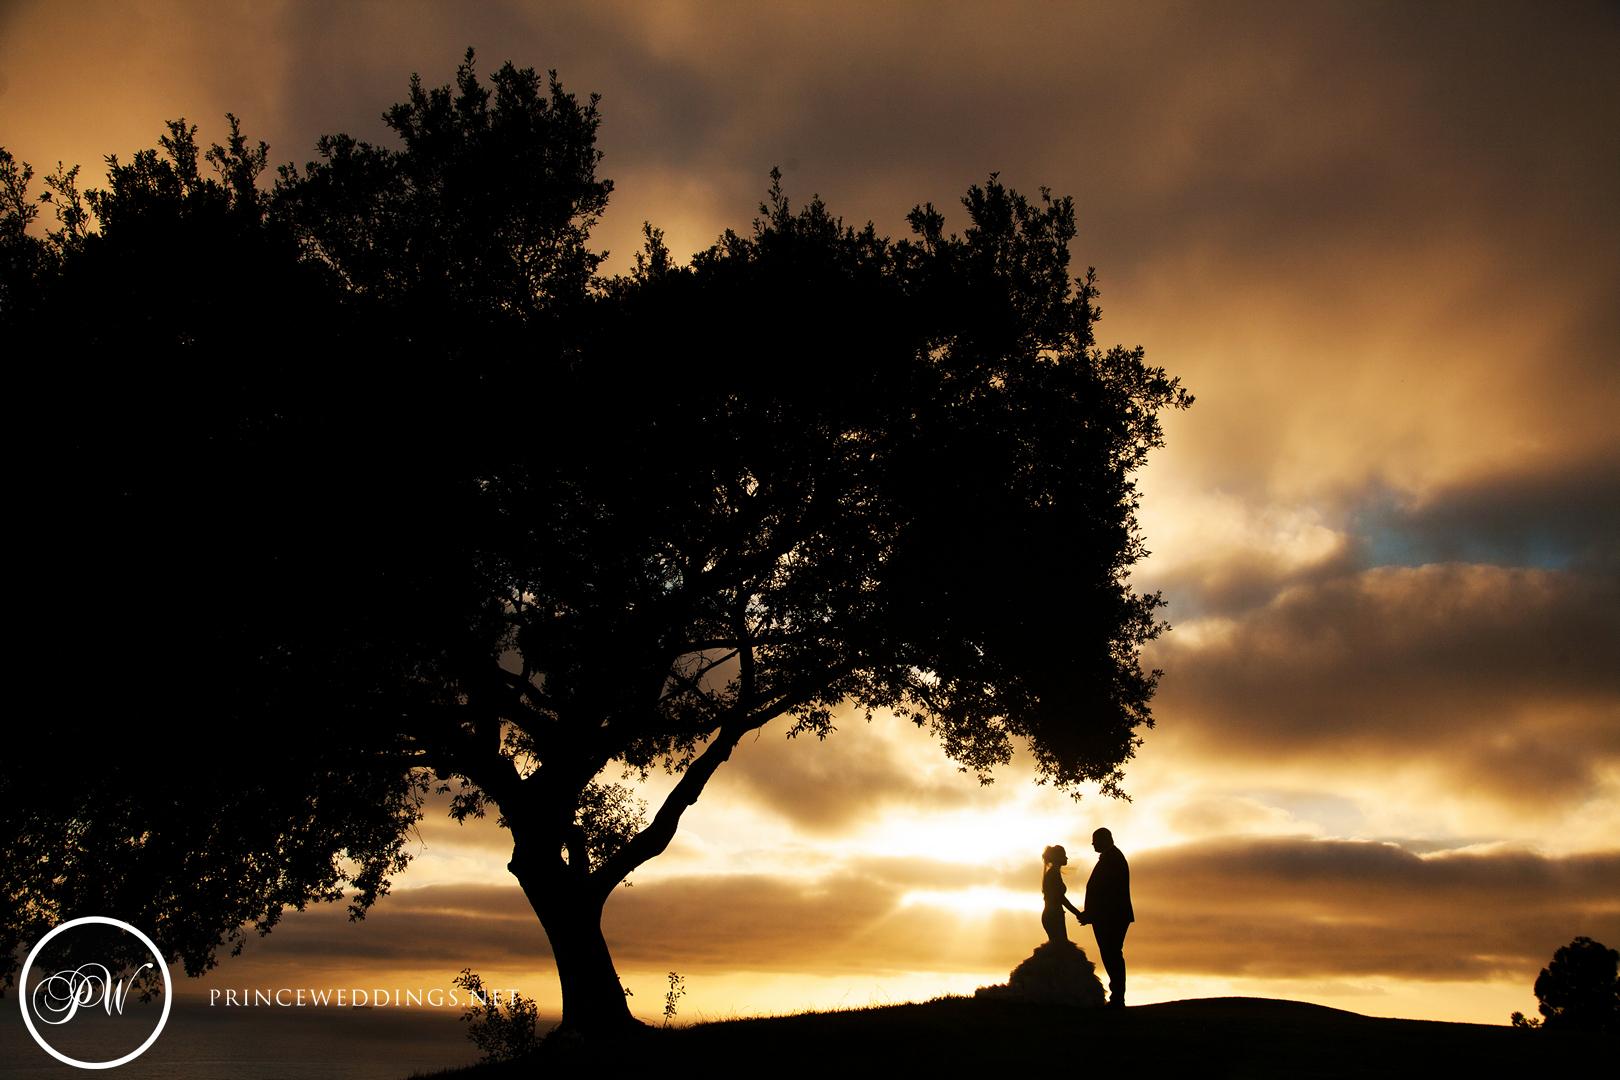 Los-Verdes-Golf-CoursePhoto14.jpg